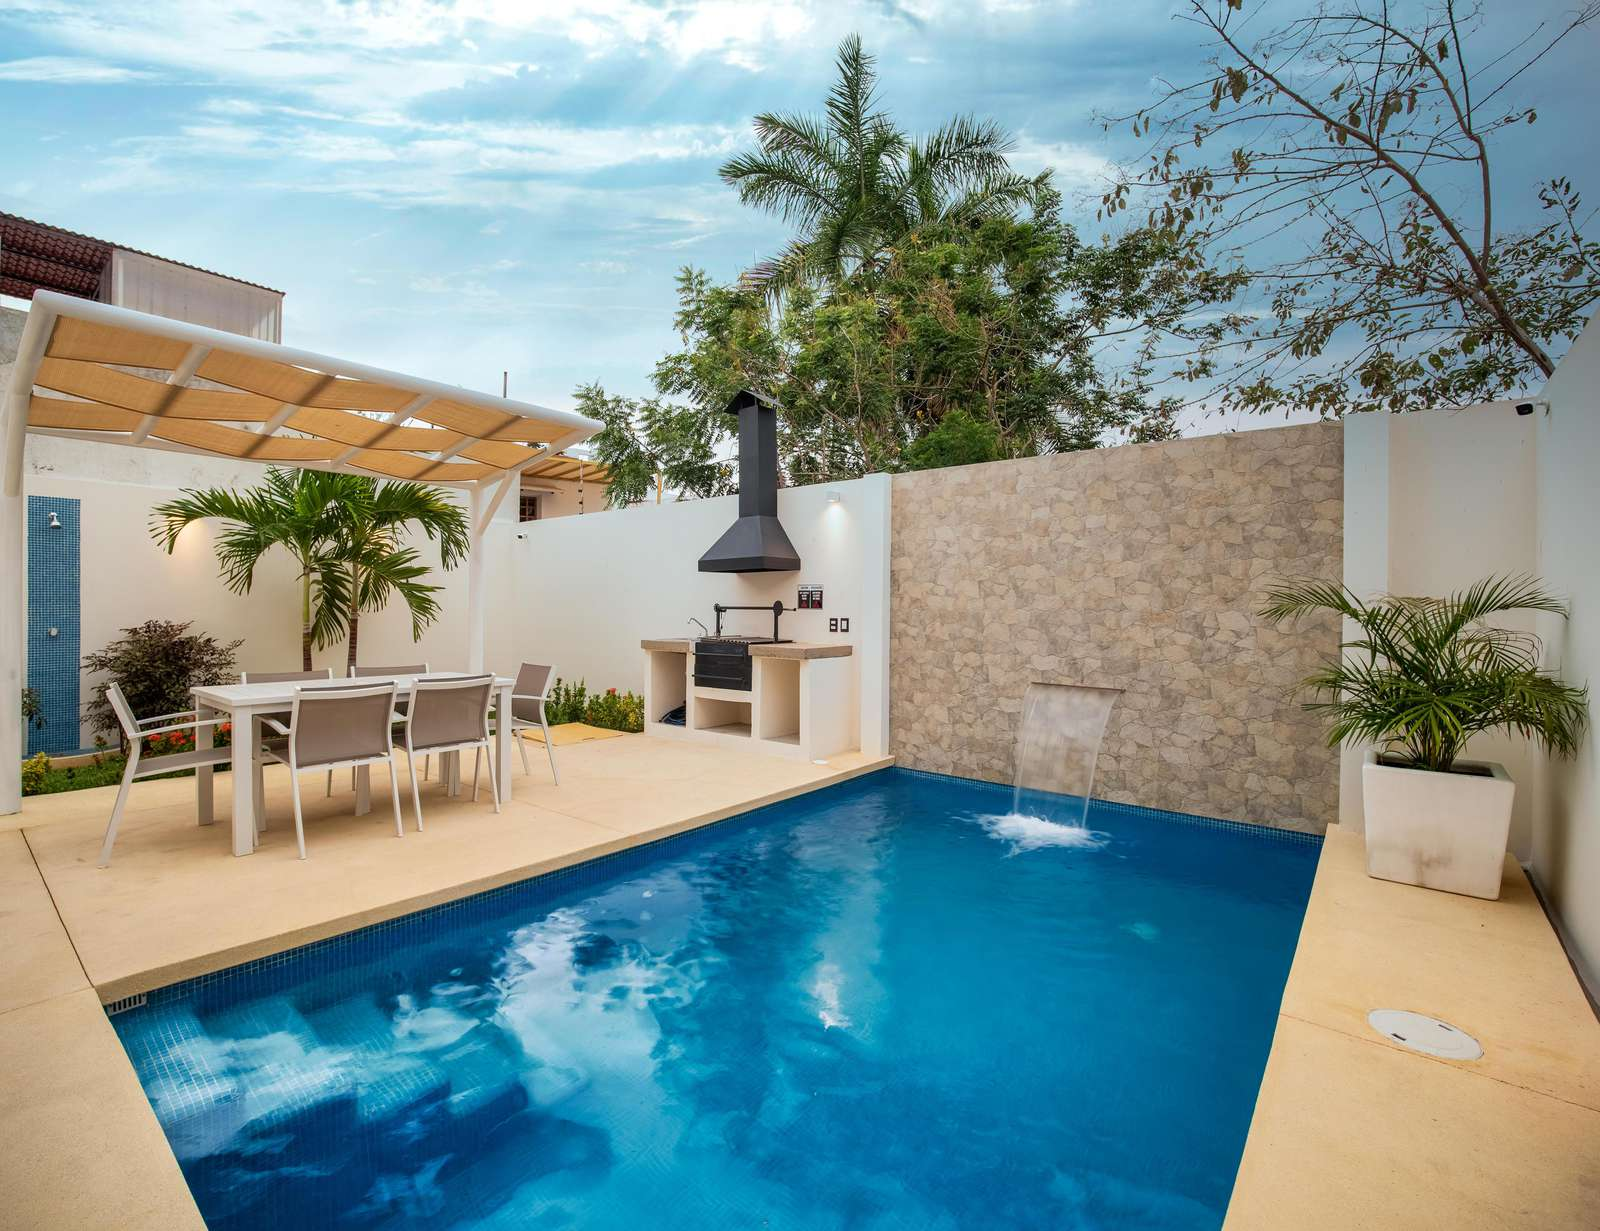 86413 – Casa Malbec - property